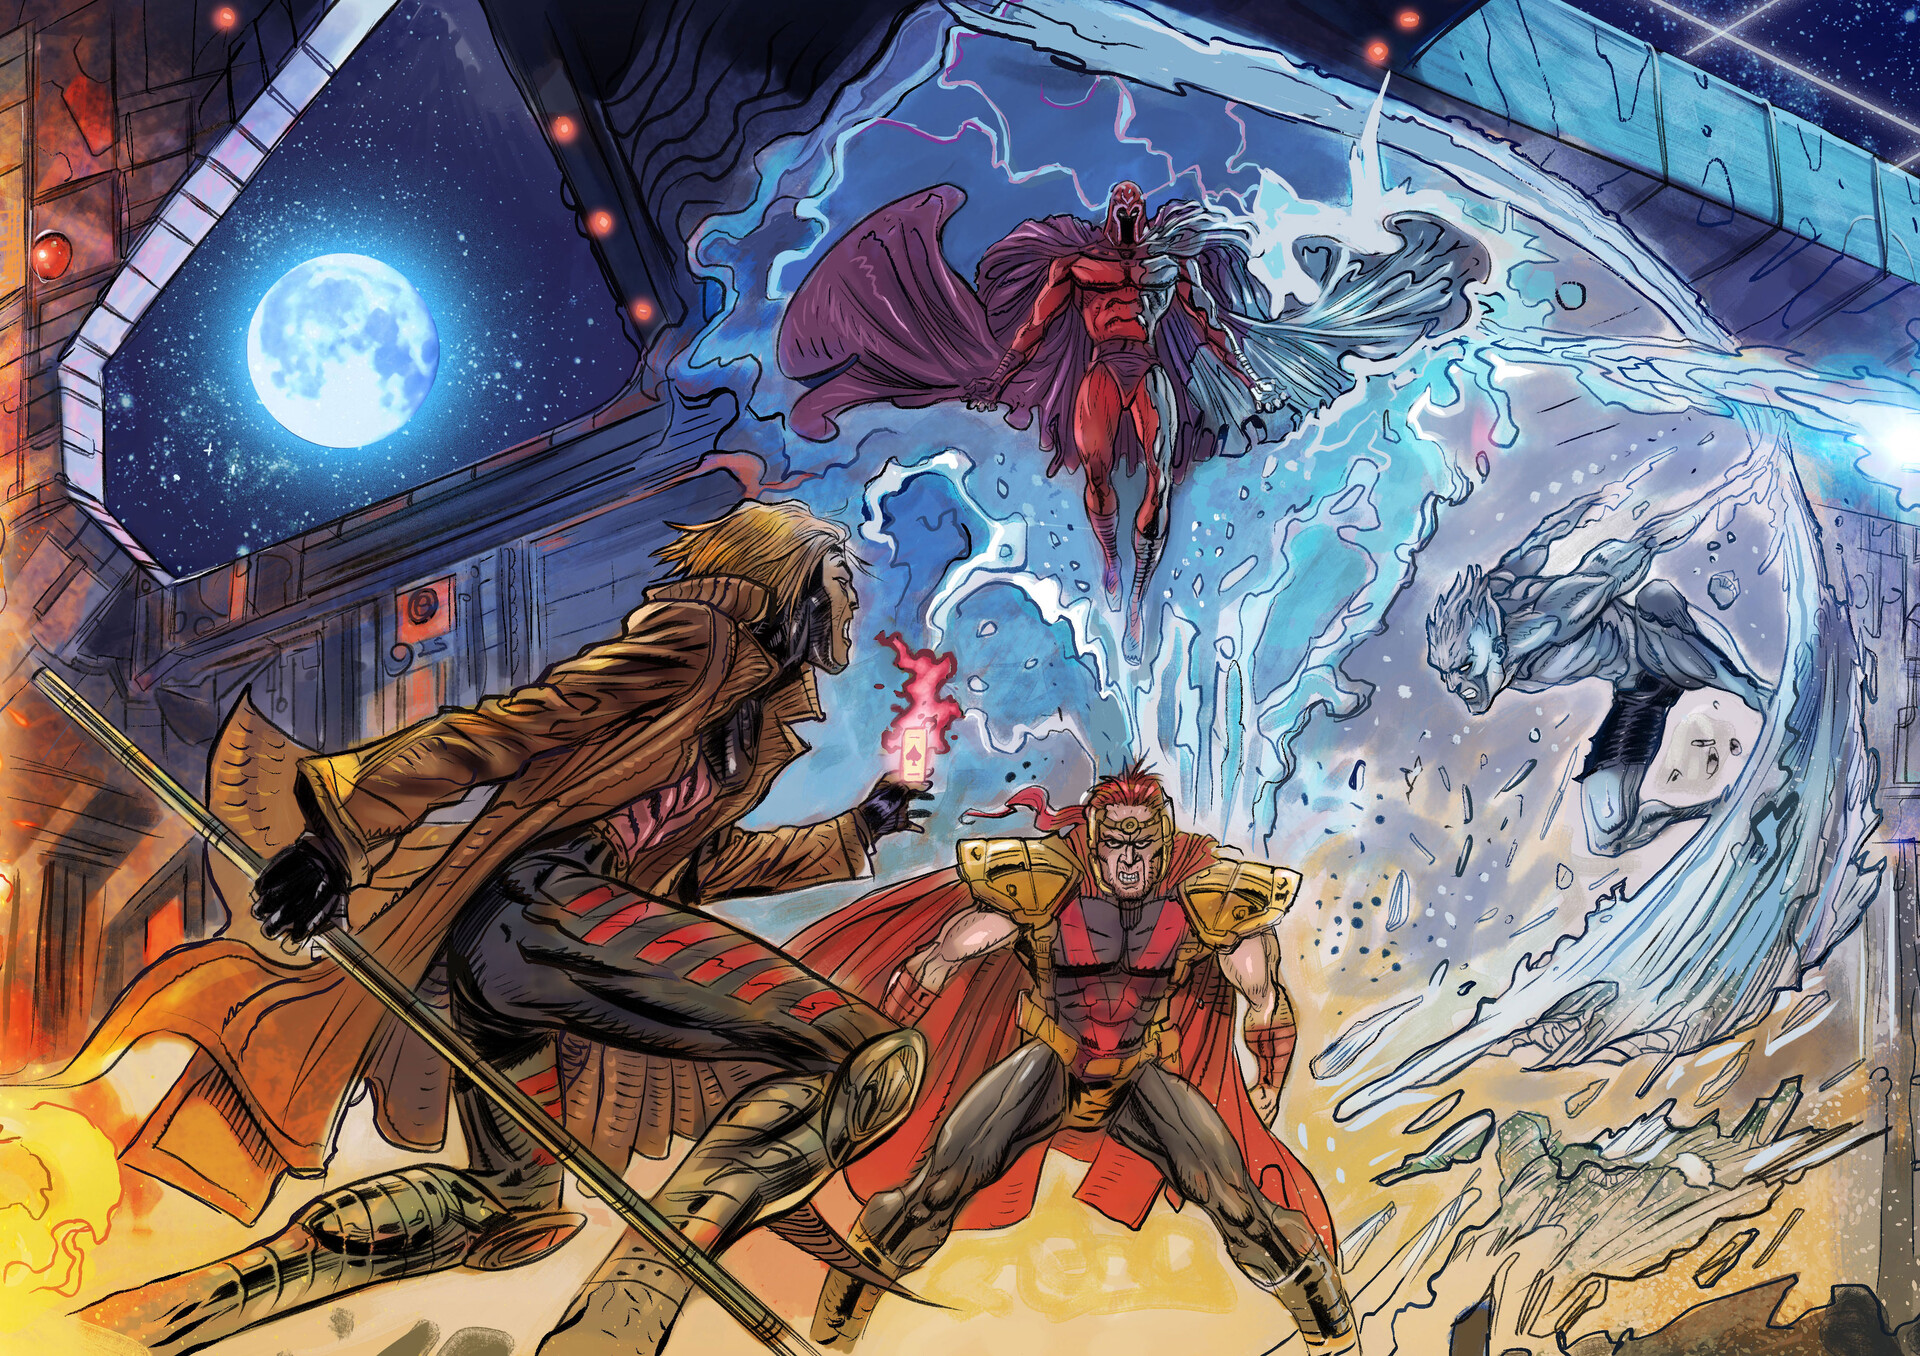 X-Men - Mutant Insurrection: Magneto Showdown (panel 2 of 4)